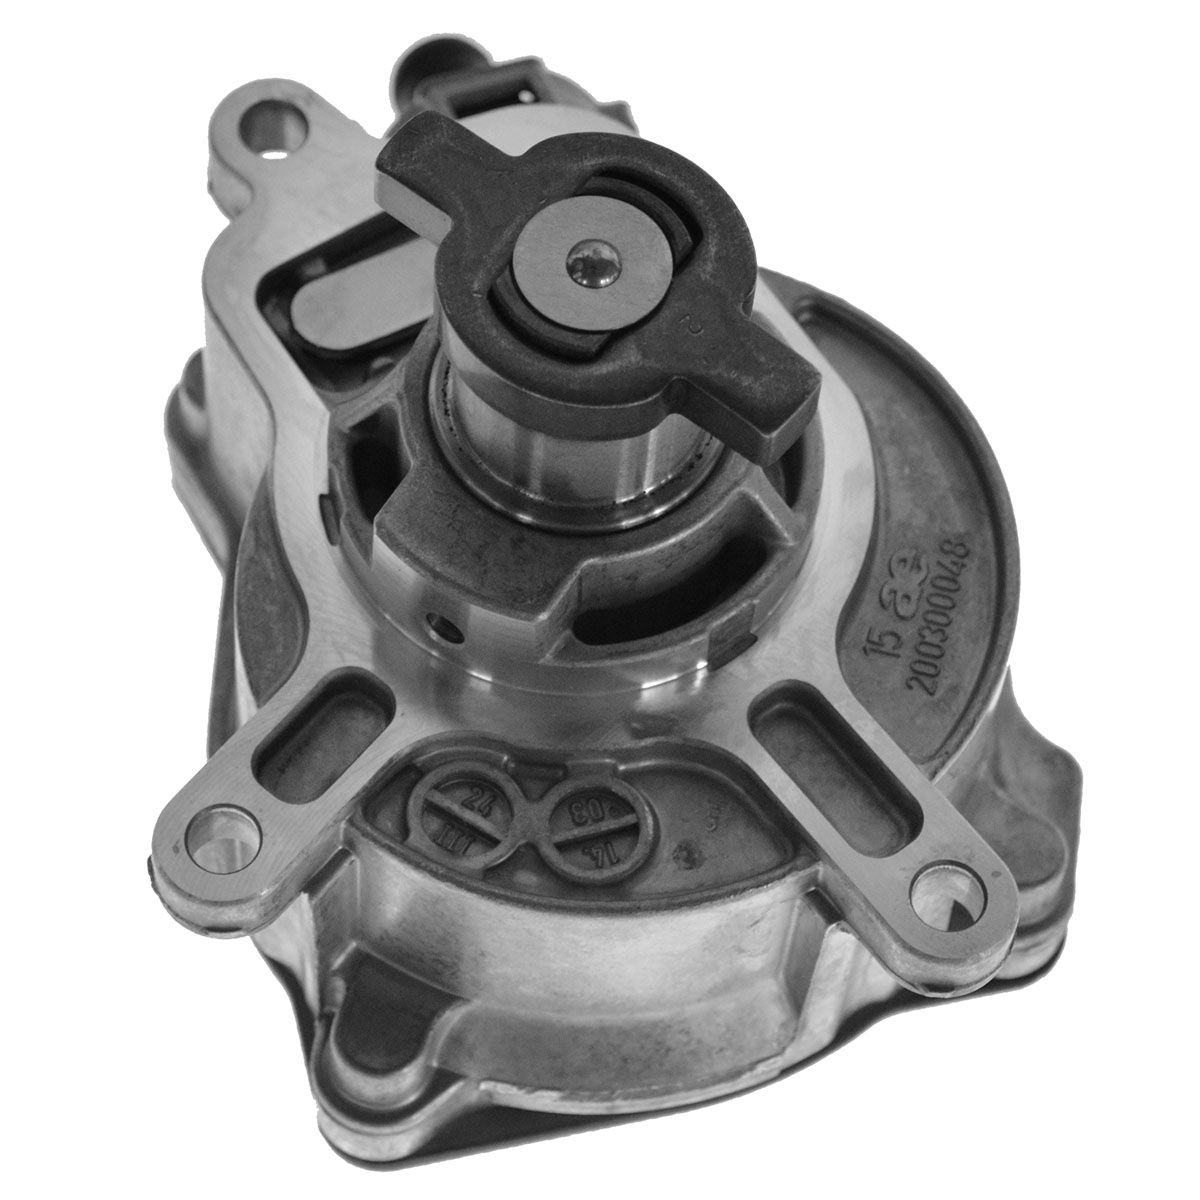 OEM Vacuum Pump For Audi TT Volkswagen Jetta Rabbit Beetle